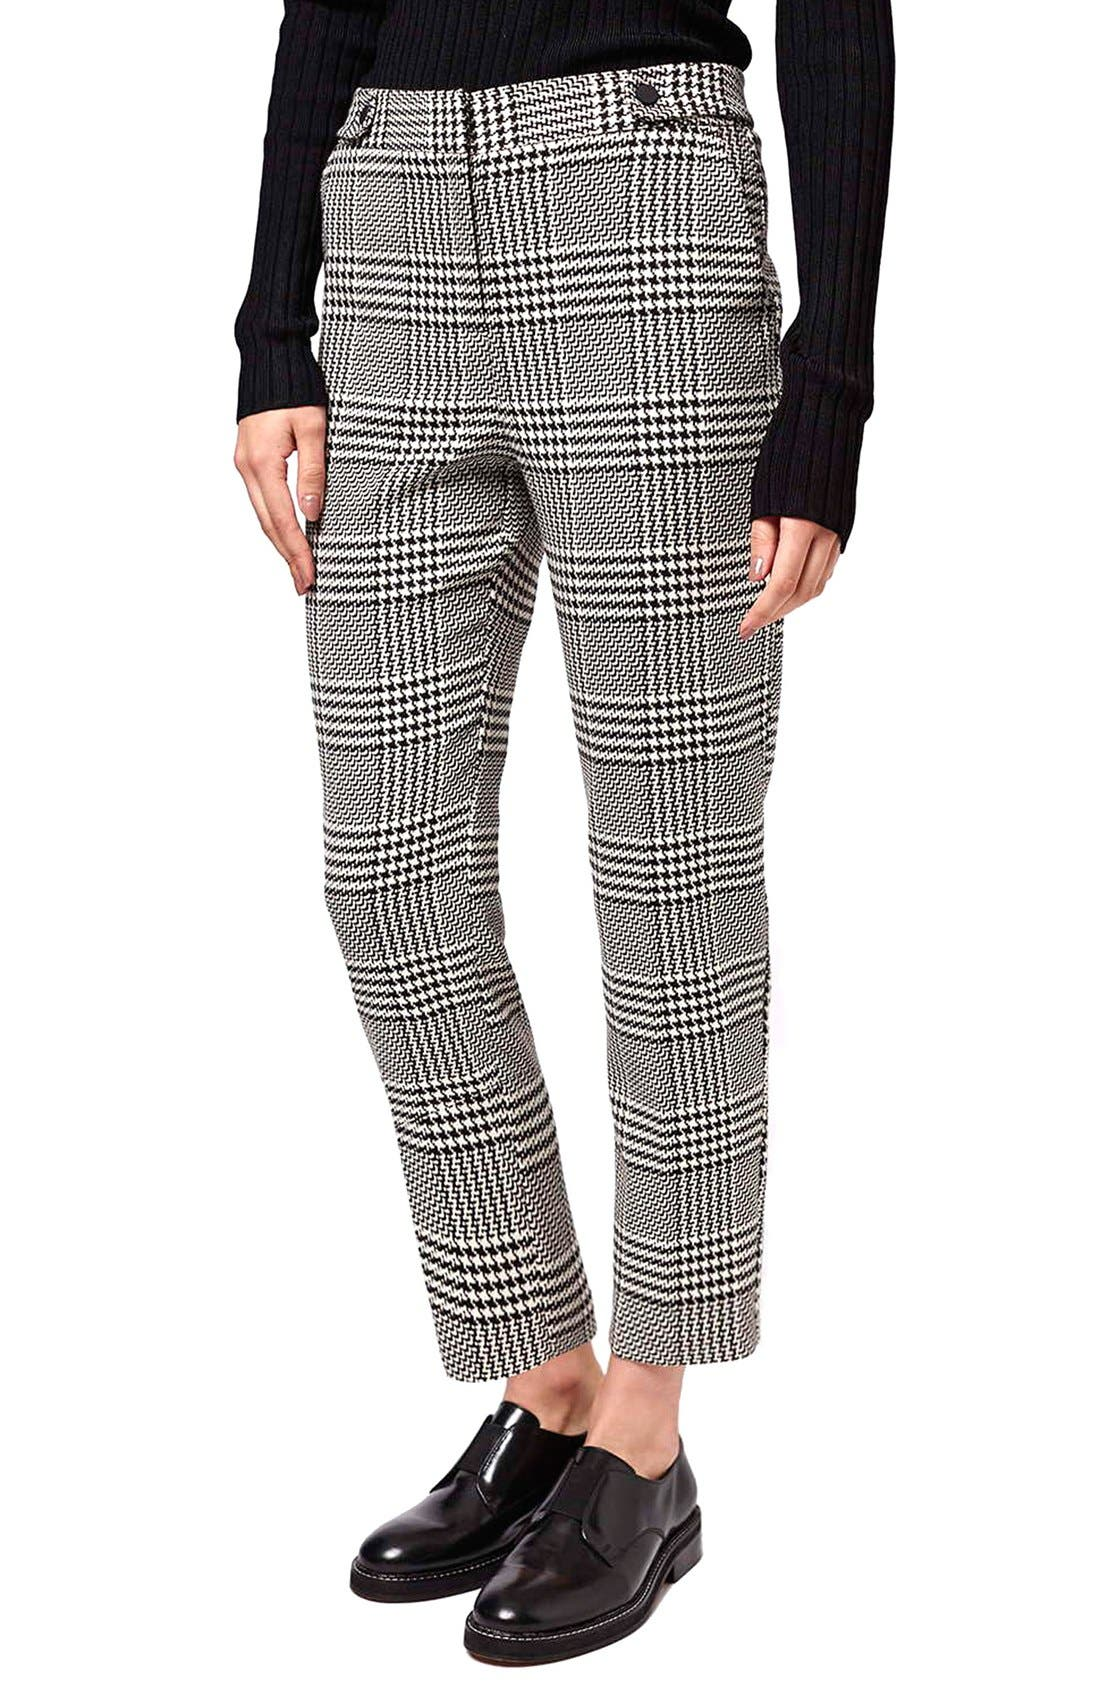 Alternate Image 1 Selected - Topshop Prince of Wales Cigarette Pants (Petite)